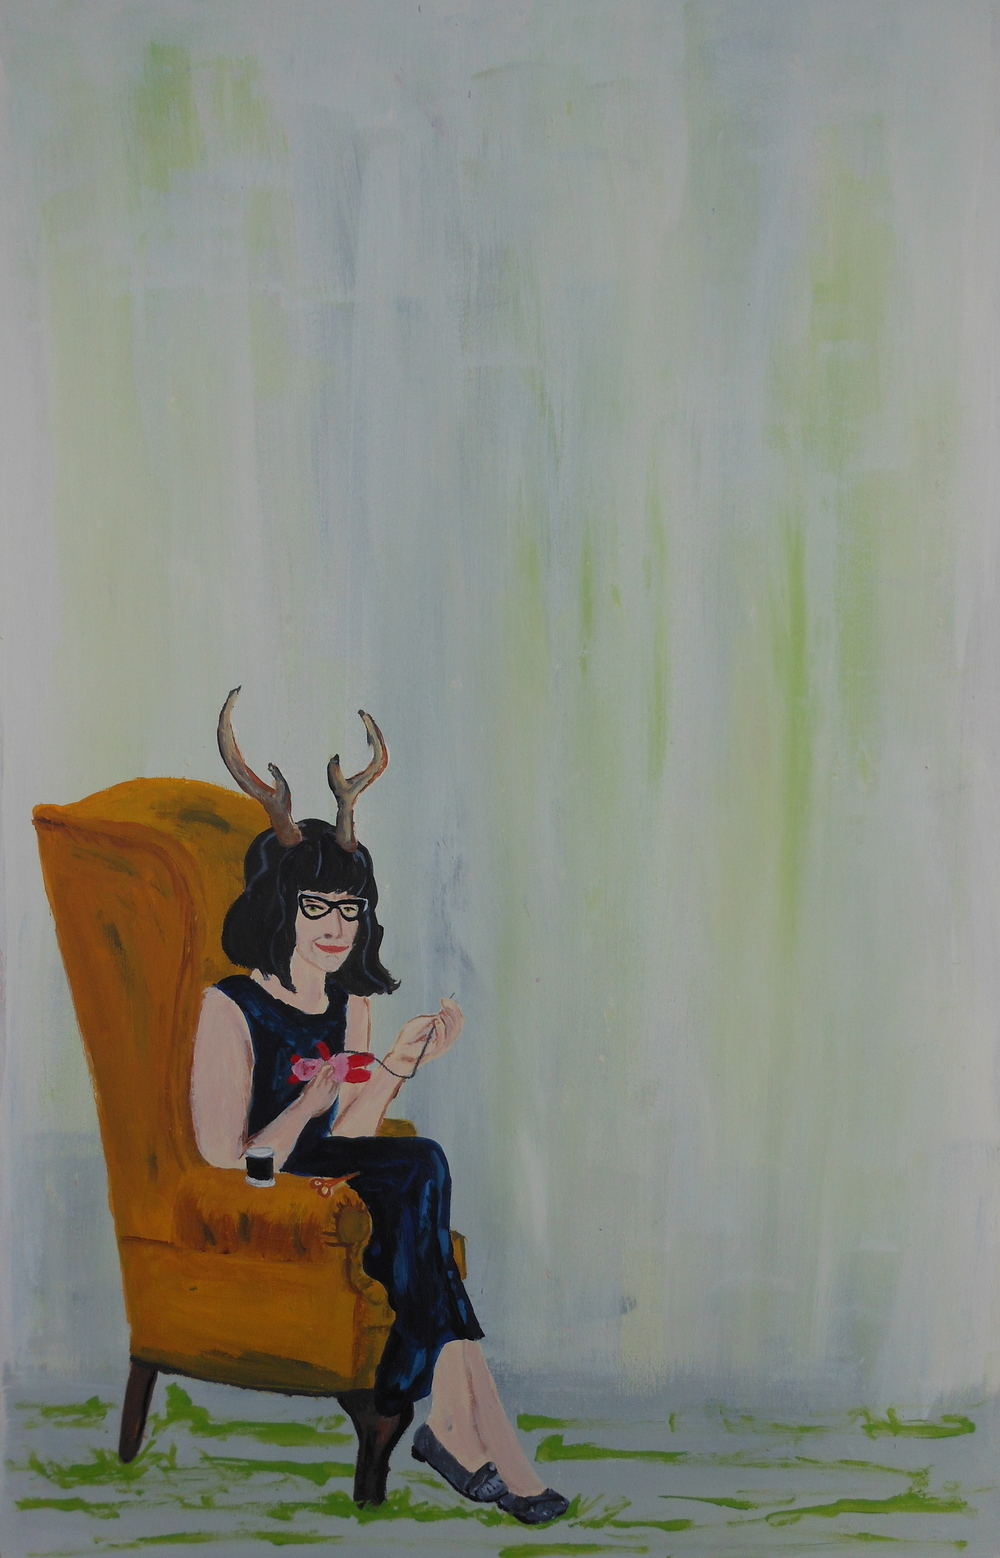 self portrait as a folk artist (2014)